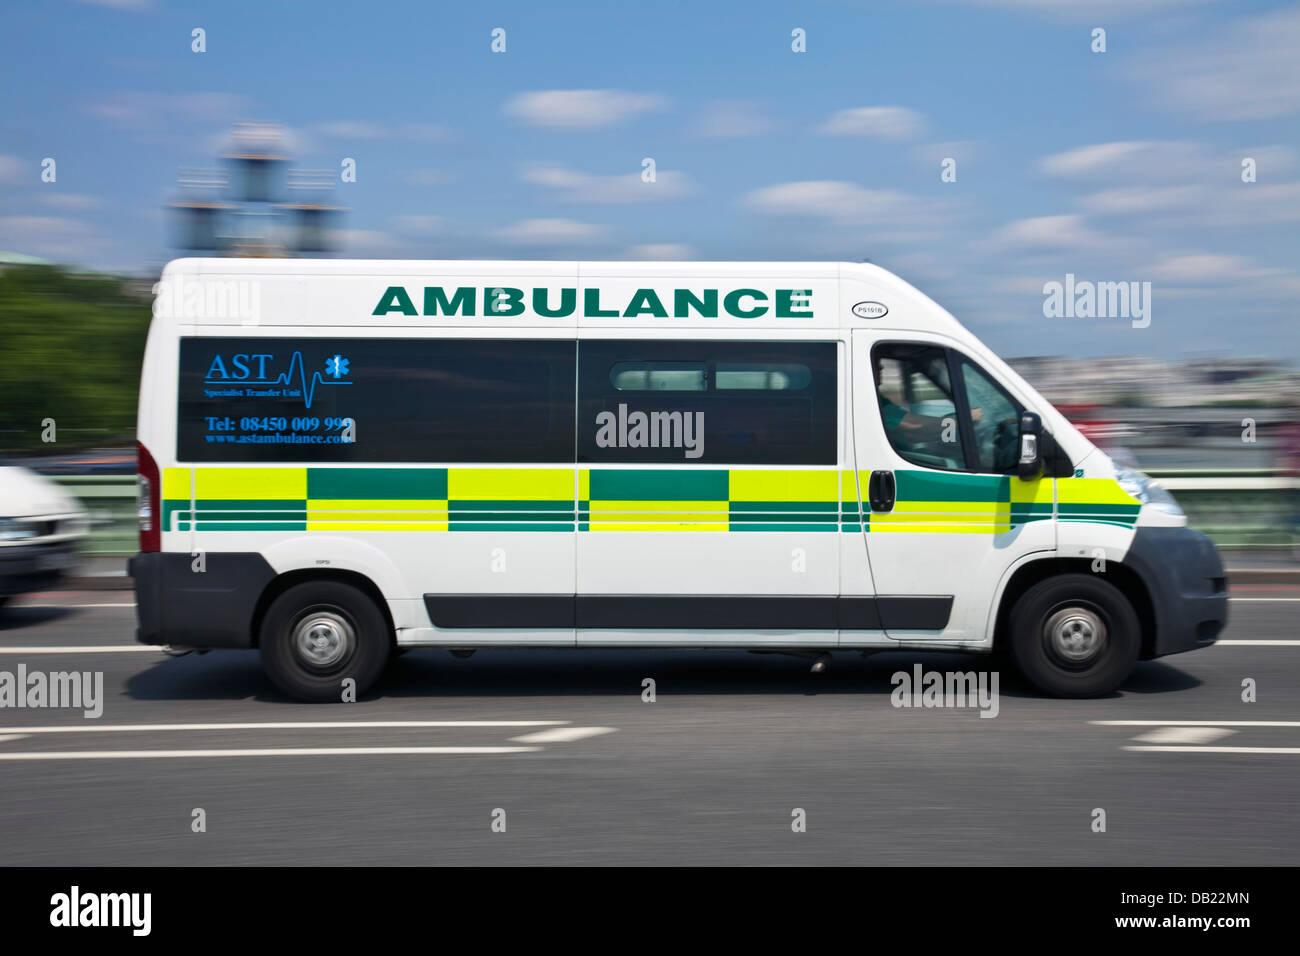 London Ambulance Crossing Westminster Bridge, London, England - Stock Image